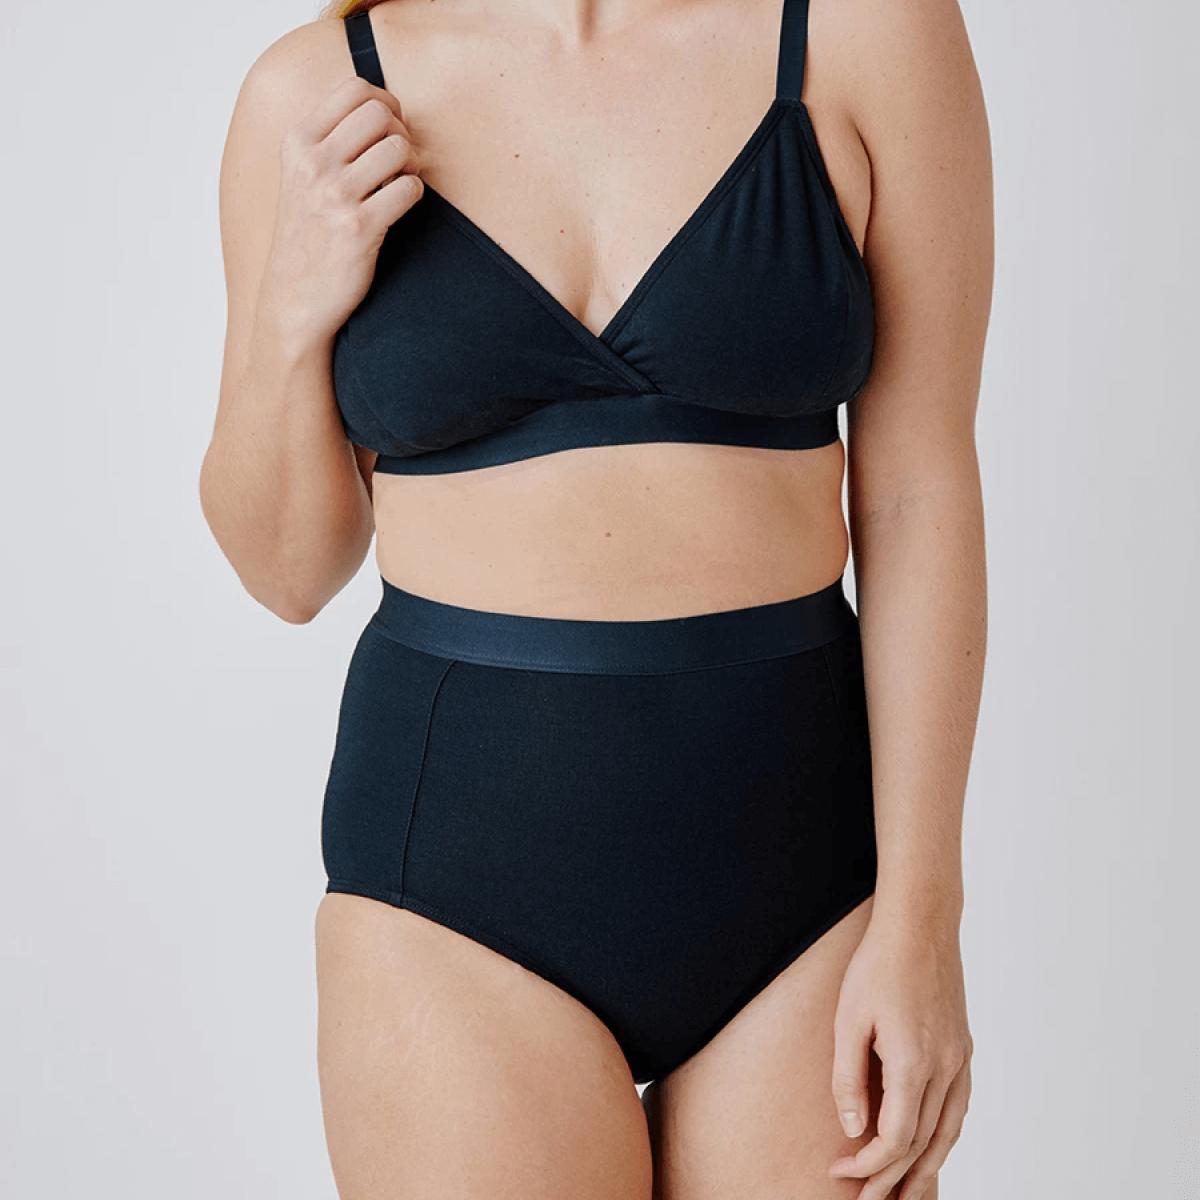 Kala bra and undies